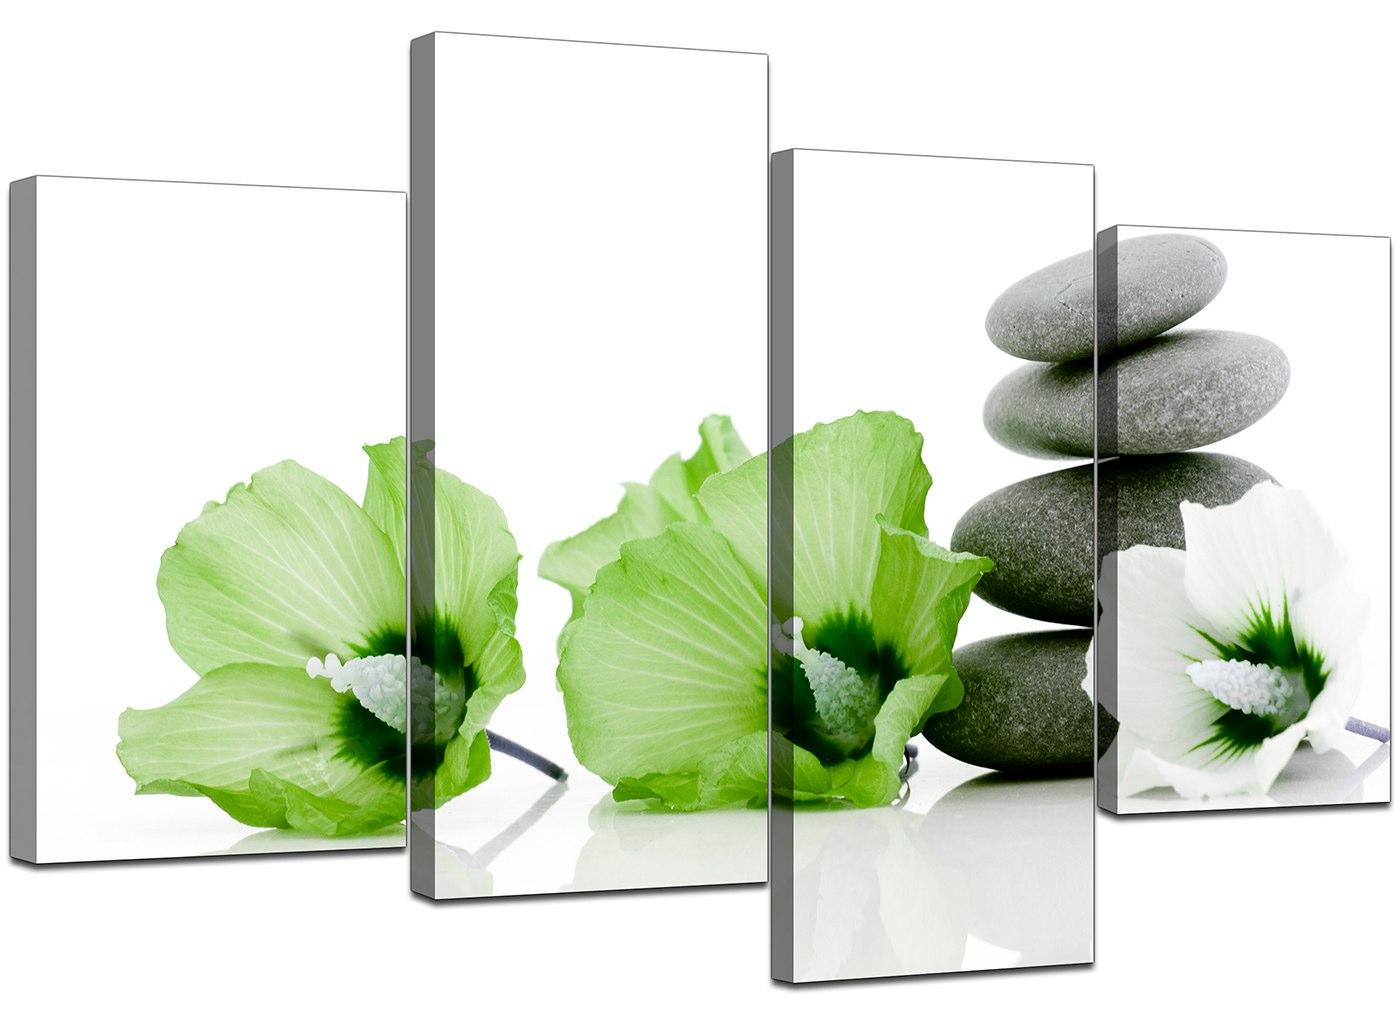 Image gallery lime green framed art for Lime green wall art